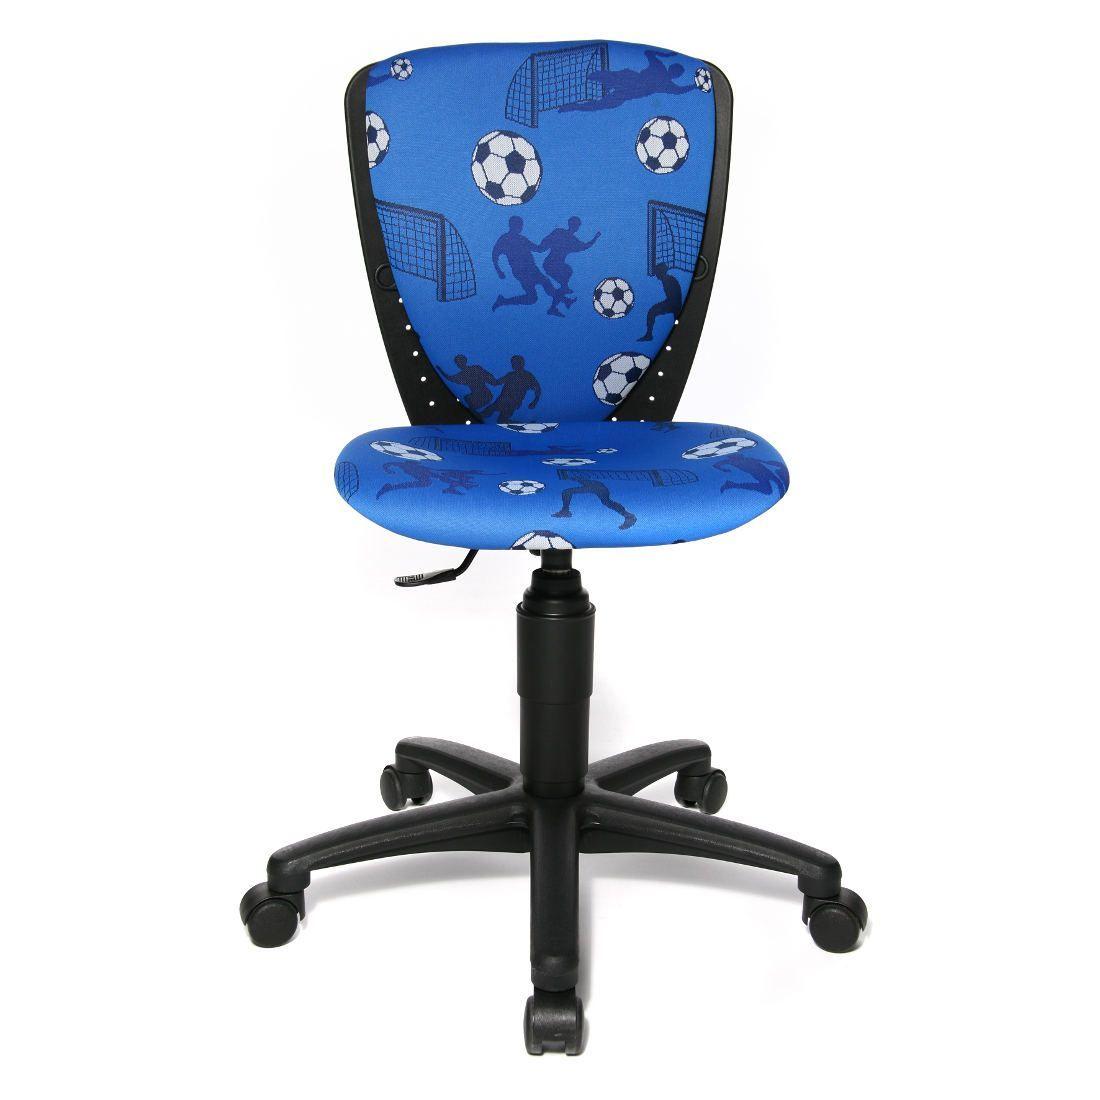 Friseurstuhl Friseursessel Bedienstuhl Friseureinrichtung Frisörstuhl 1374 blau